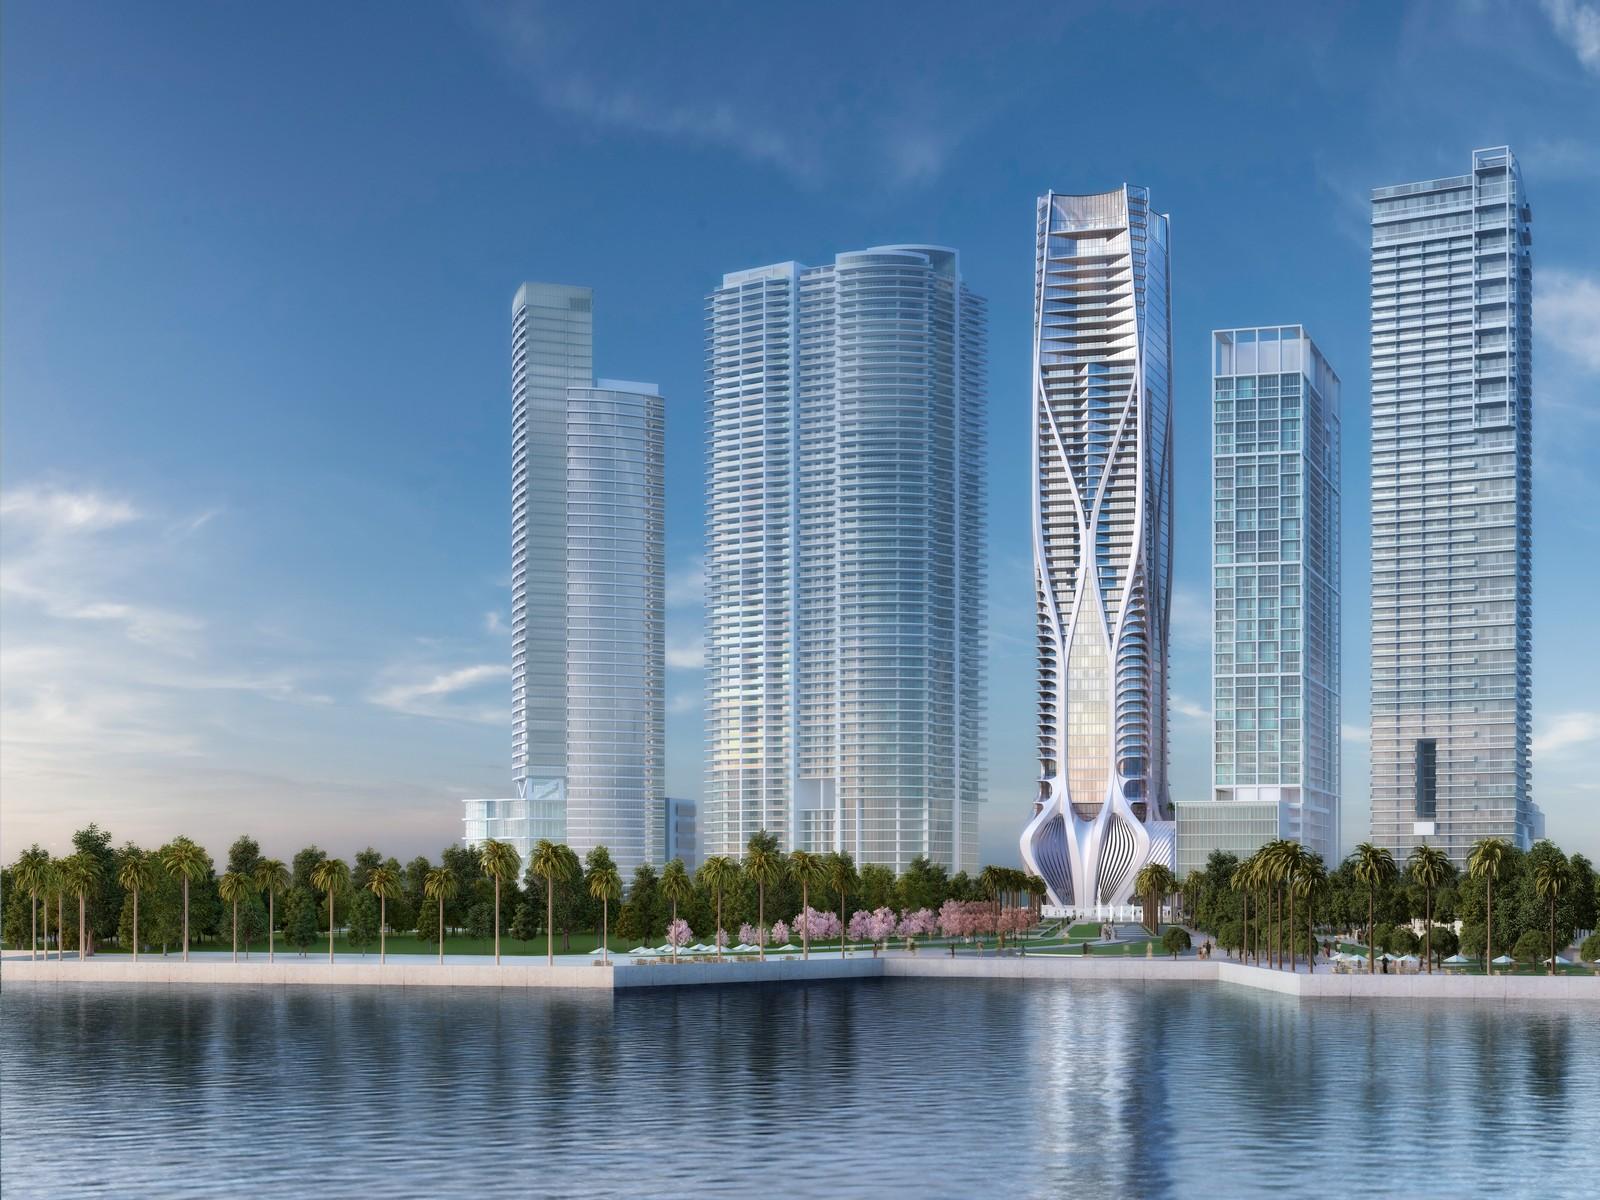 Condominium for Sale at One Thousand Museum 1000 Biscayne Blvd 5201 Miami, Florida, 33132 United States